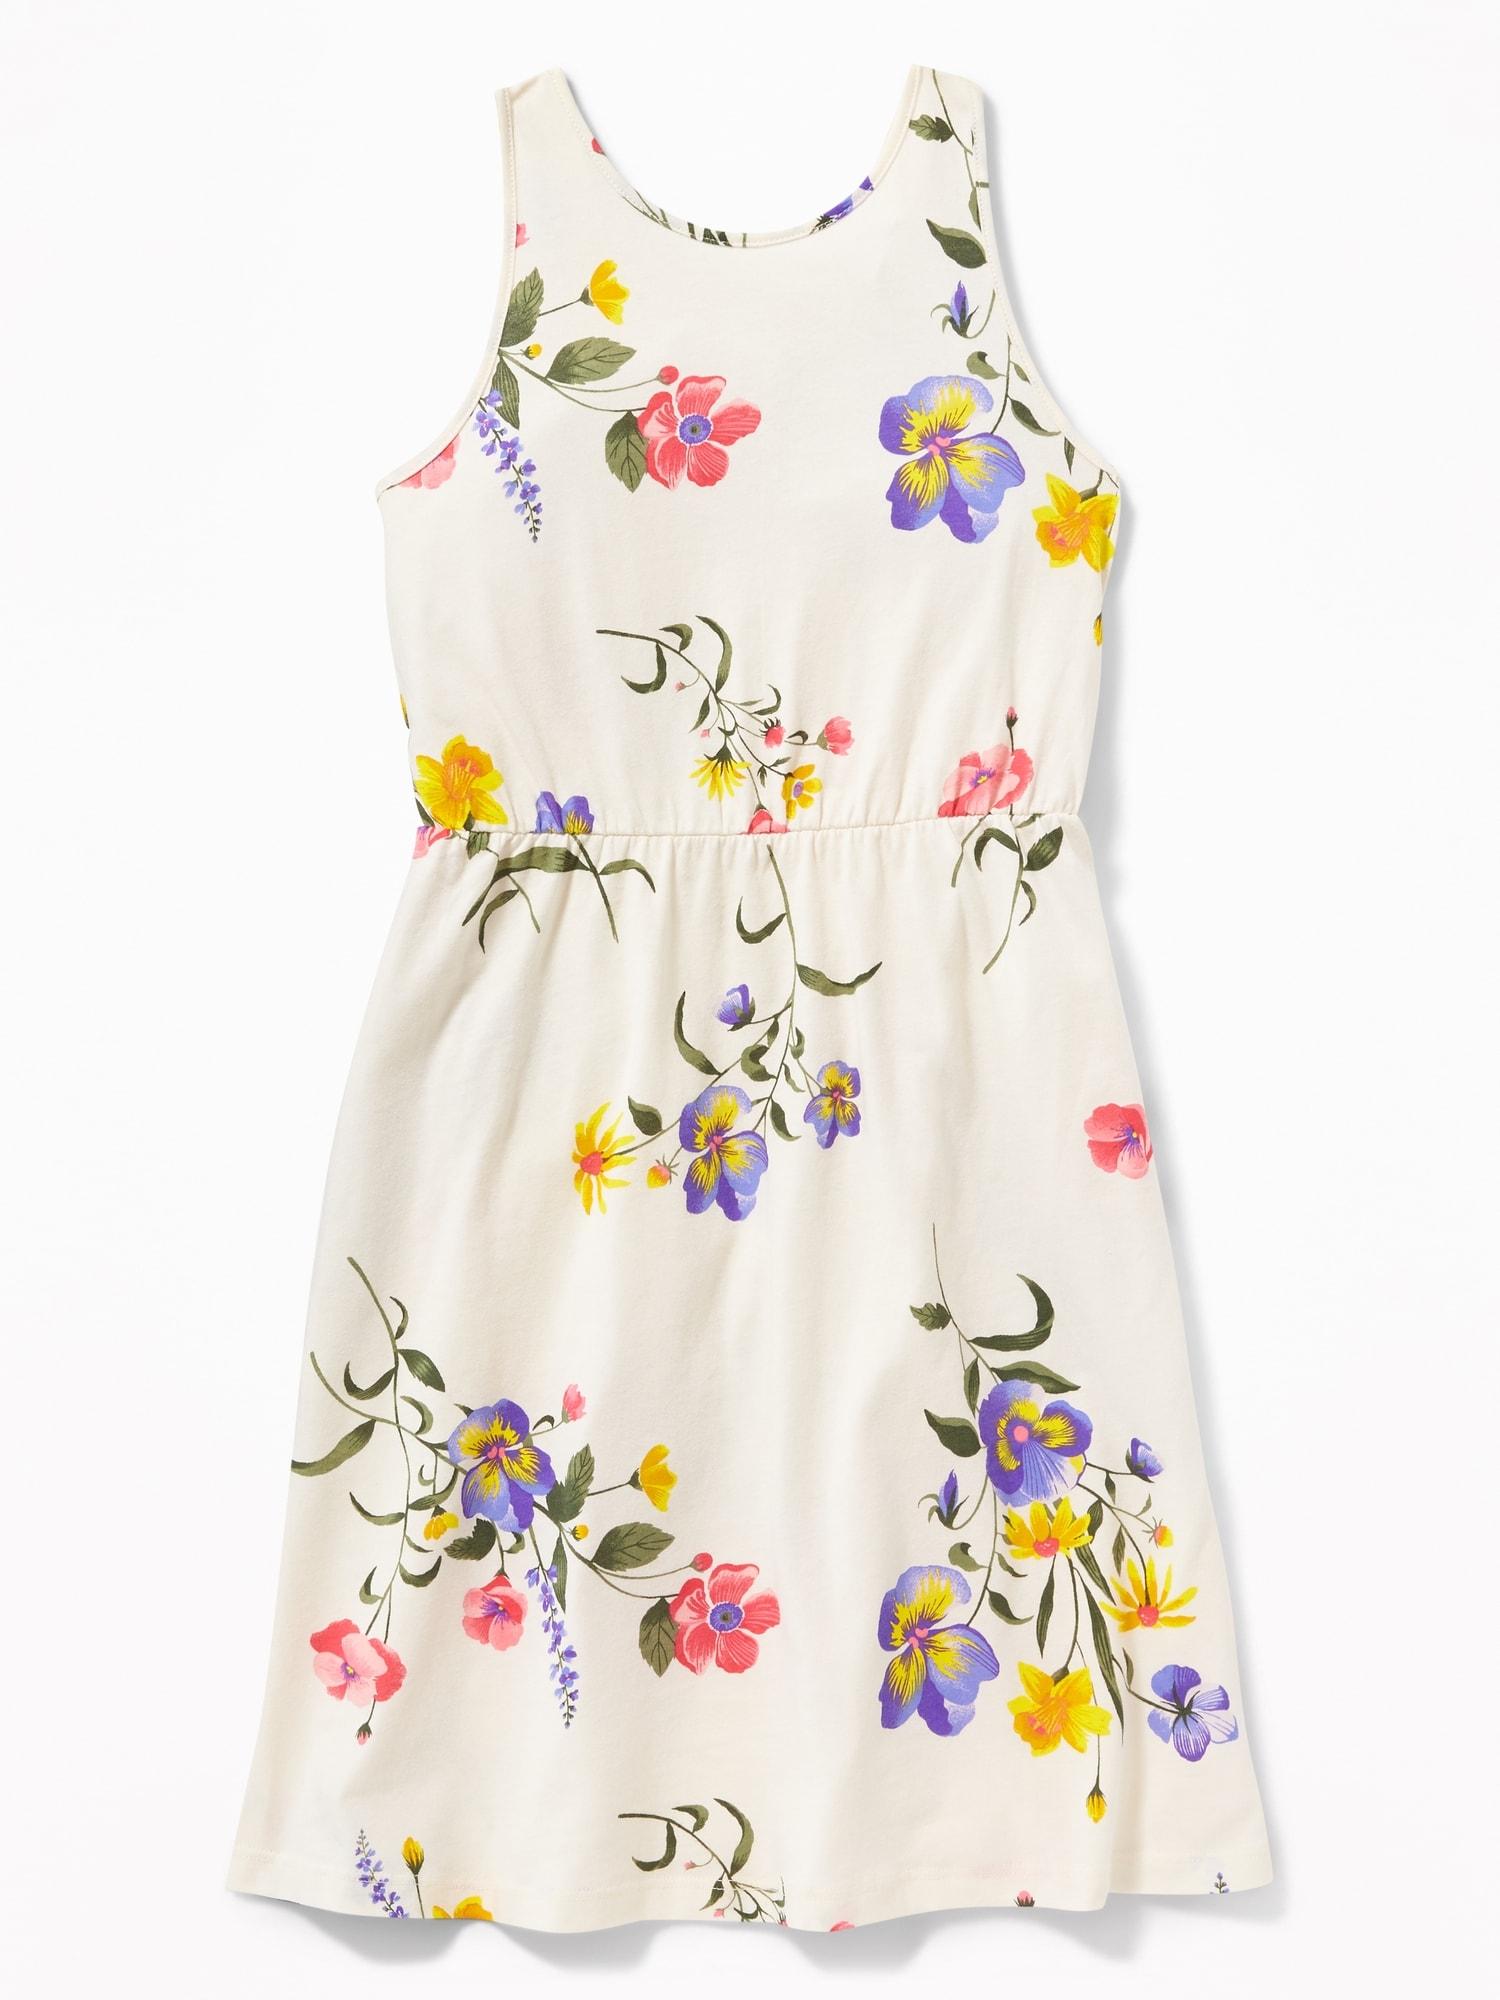 56ca3d524b5b9 Patterned Jersey Fit   Flare V-Back Dress for Girls